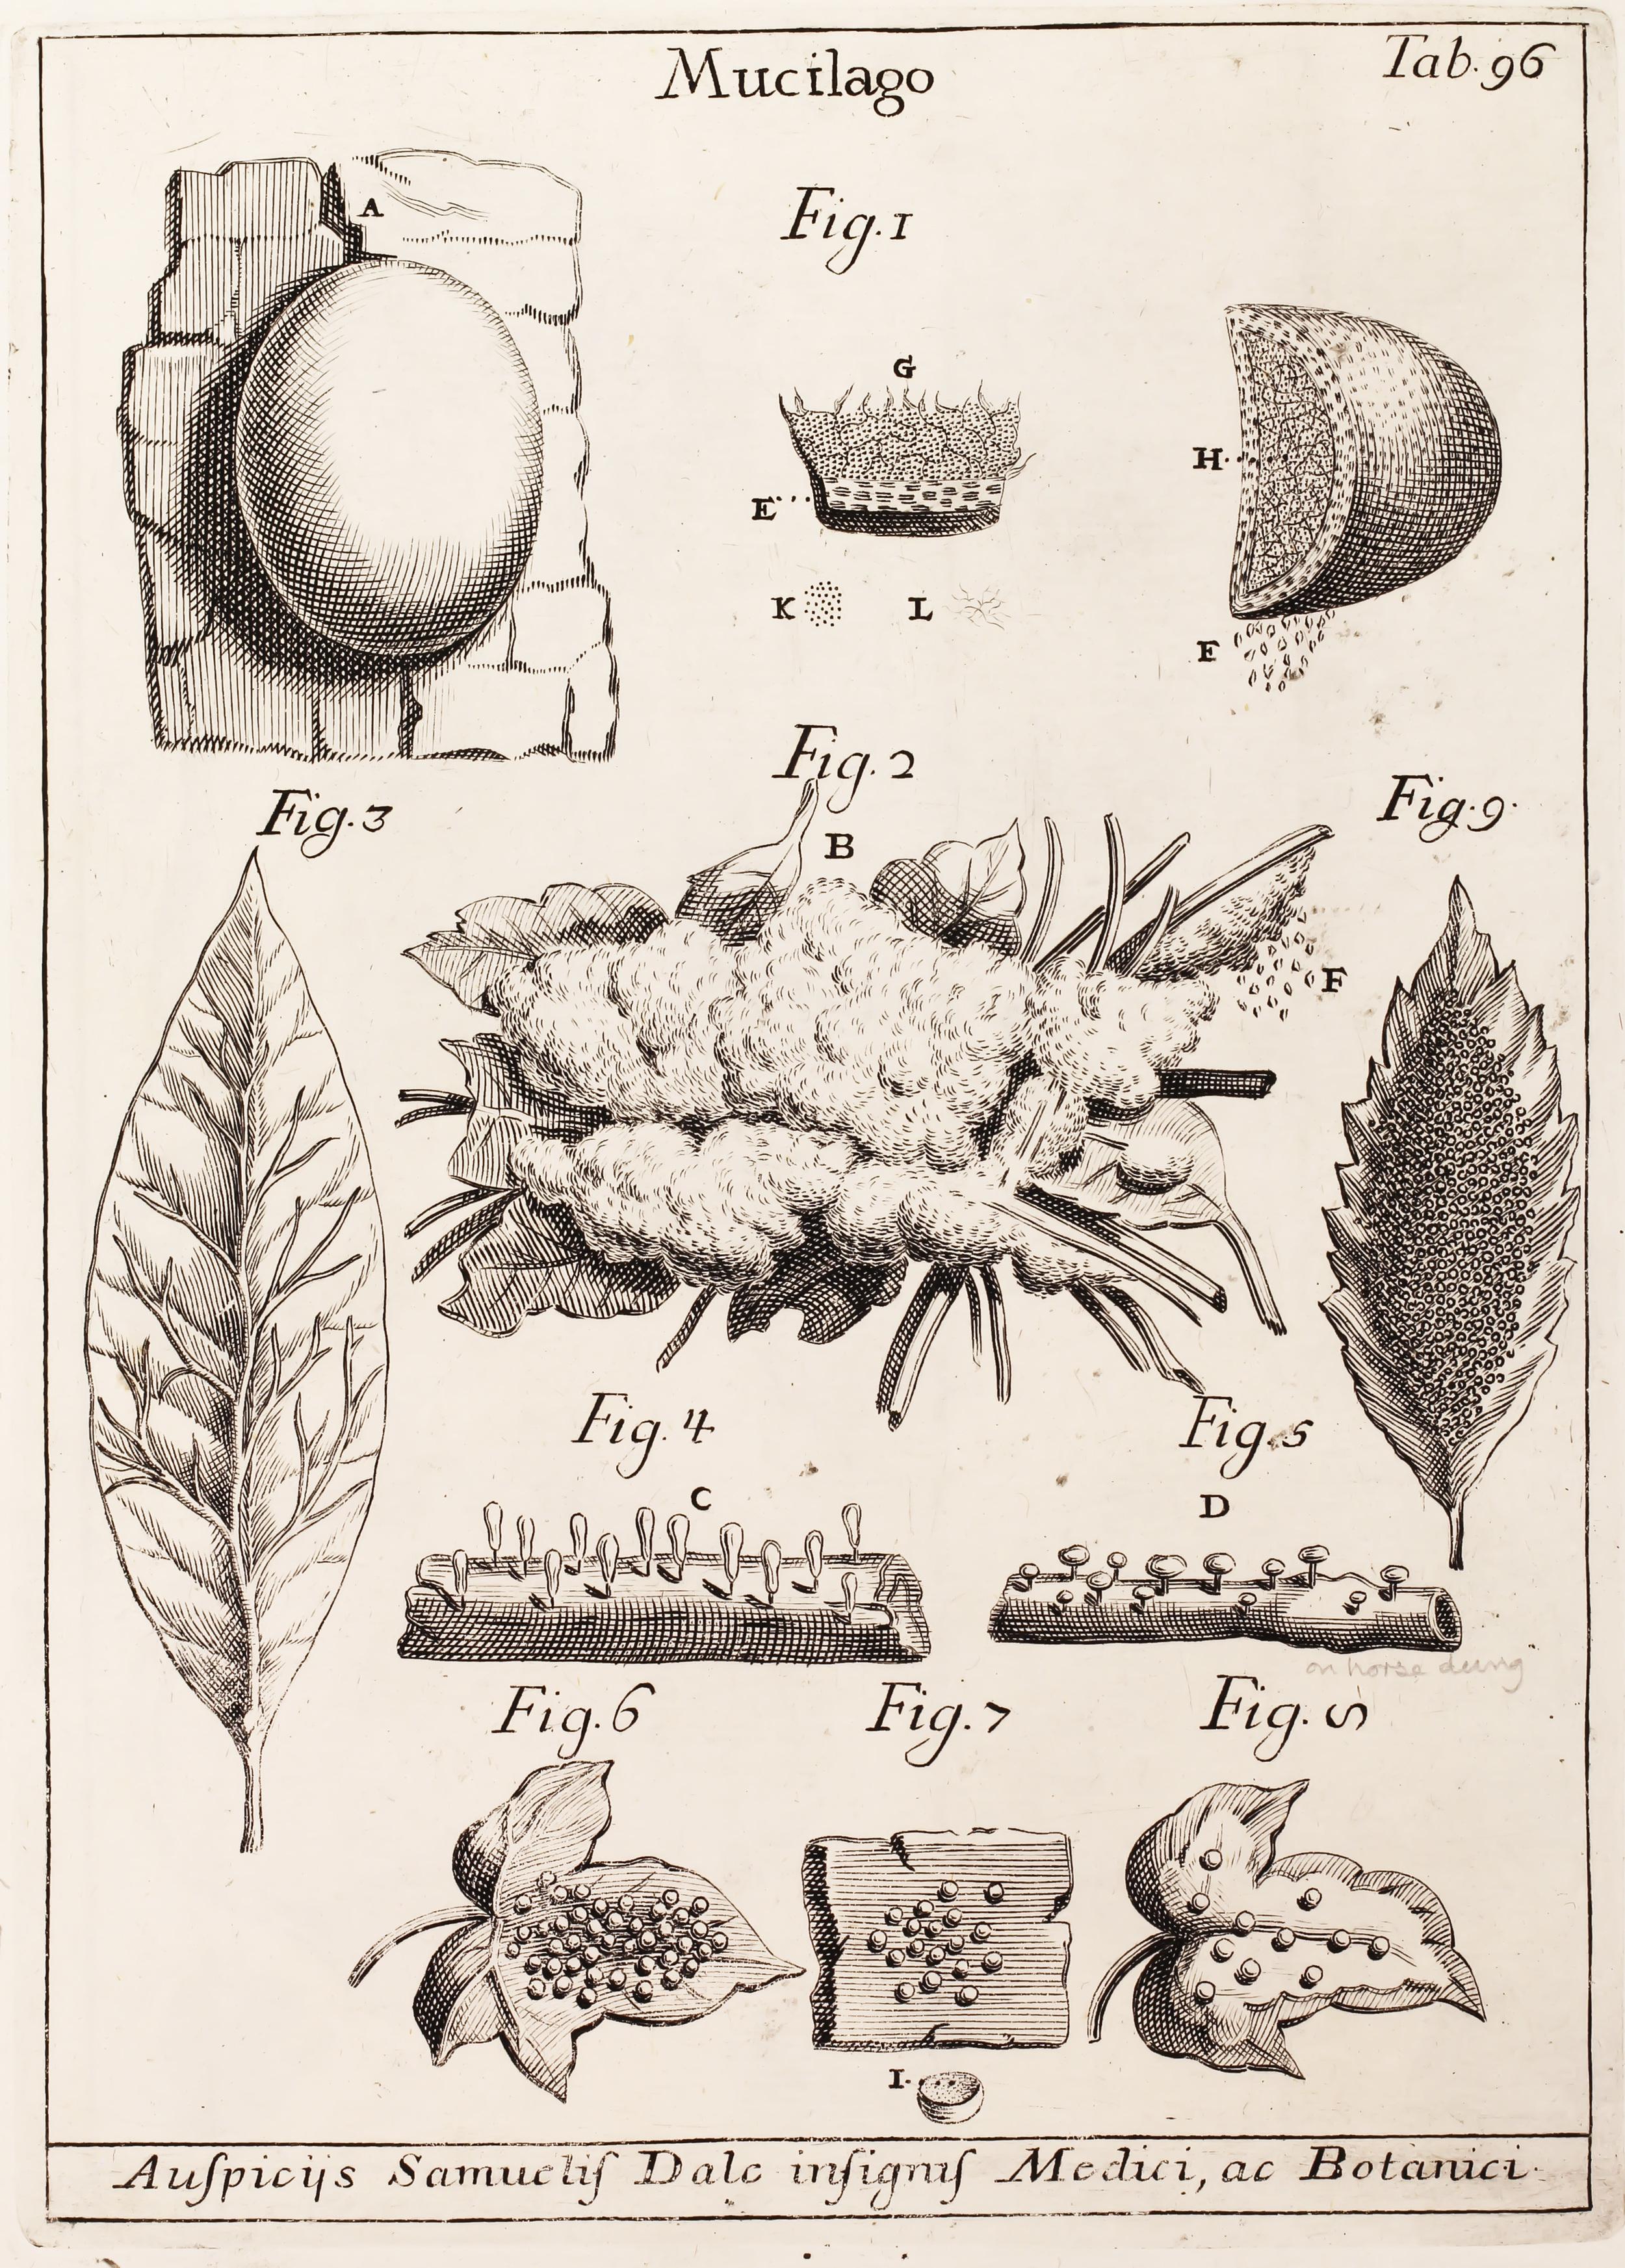 Pier Antonio Micheli, 1729. Pier discovered spore germination. Nobody really cared.